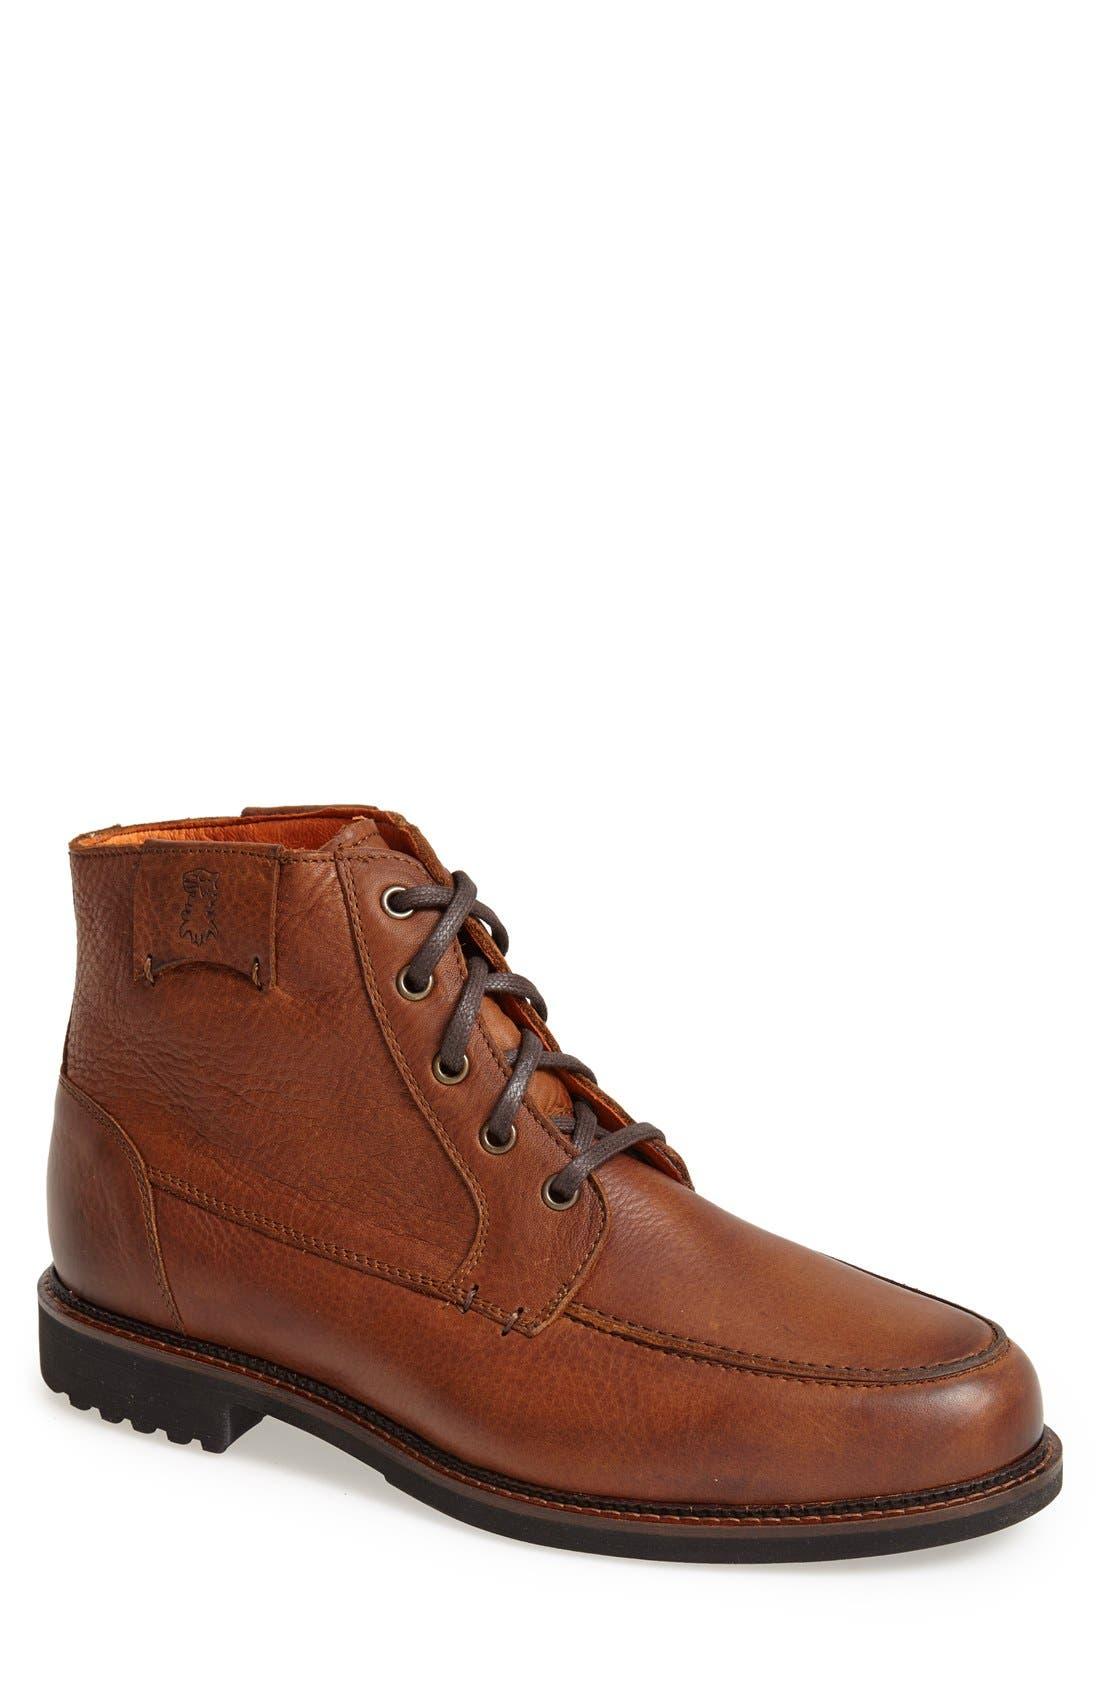 Alternate Image 1 Selected - Neil M 'Alpine' Moc Toe Boot (Men)